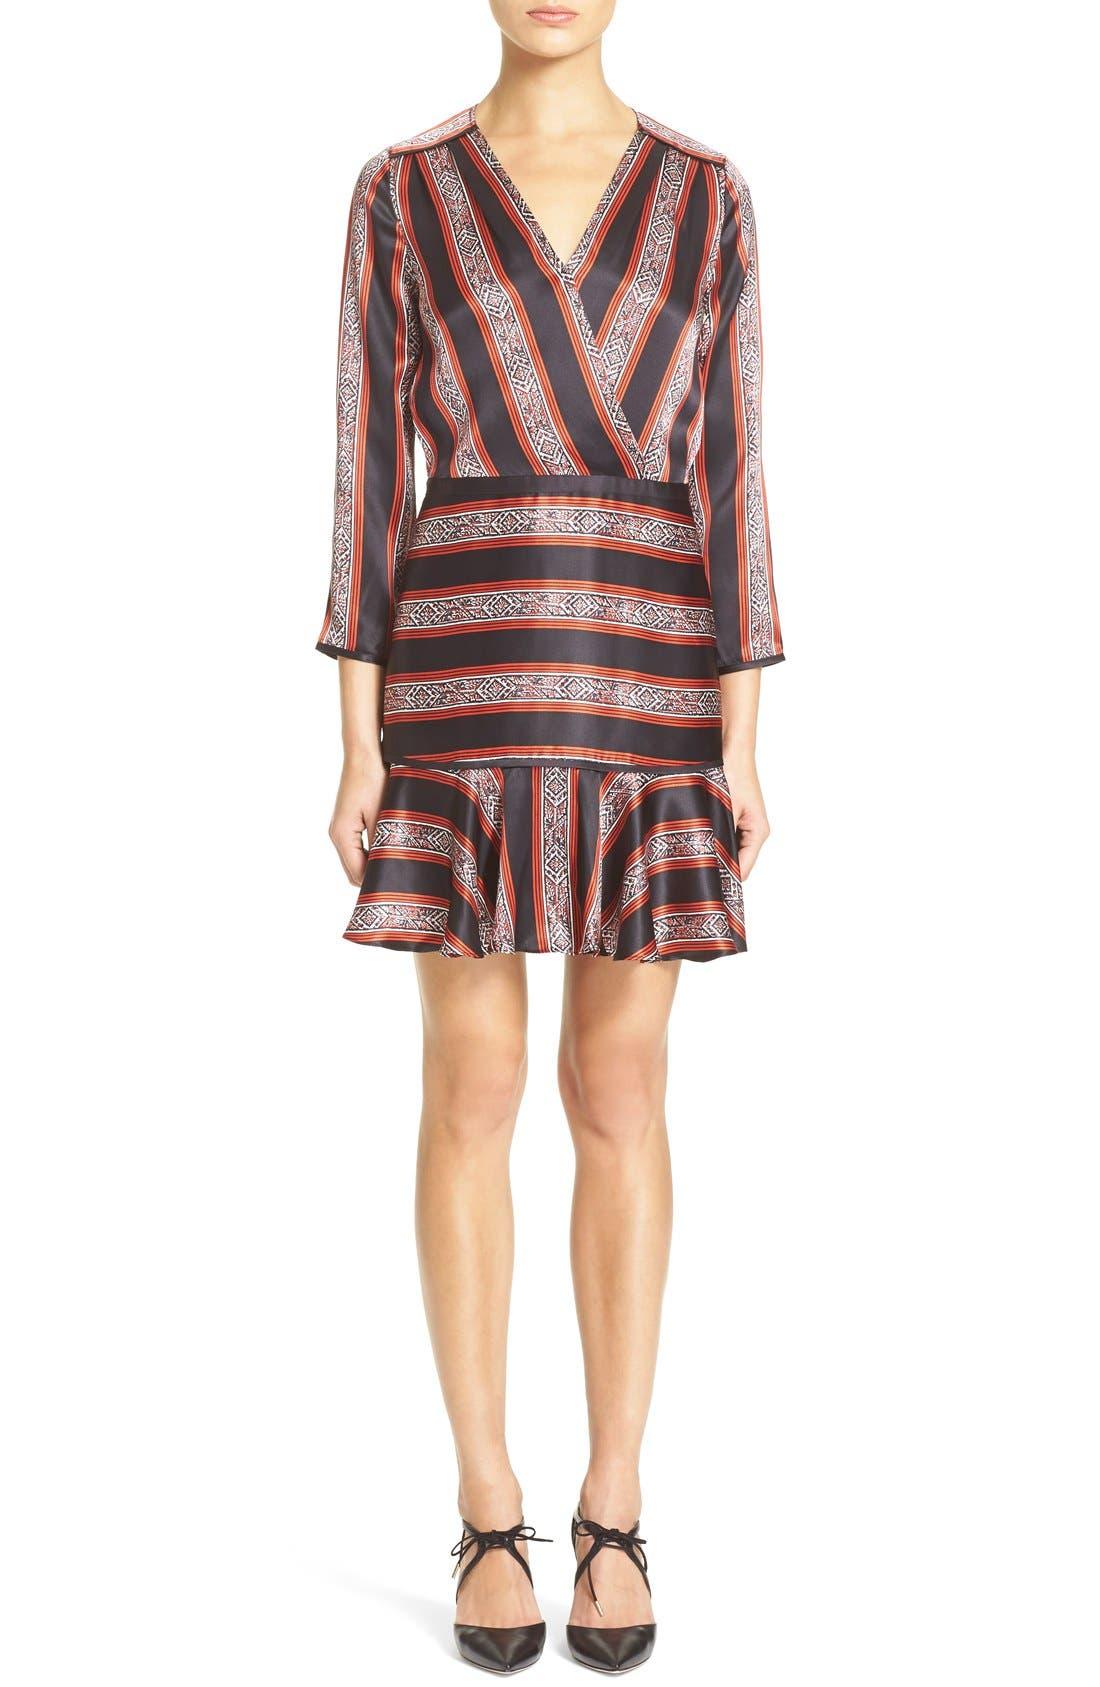 Main Image - Veronica Beard 'Ivy' Print SilkFlounce Dress